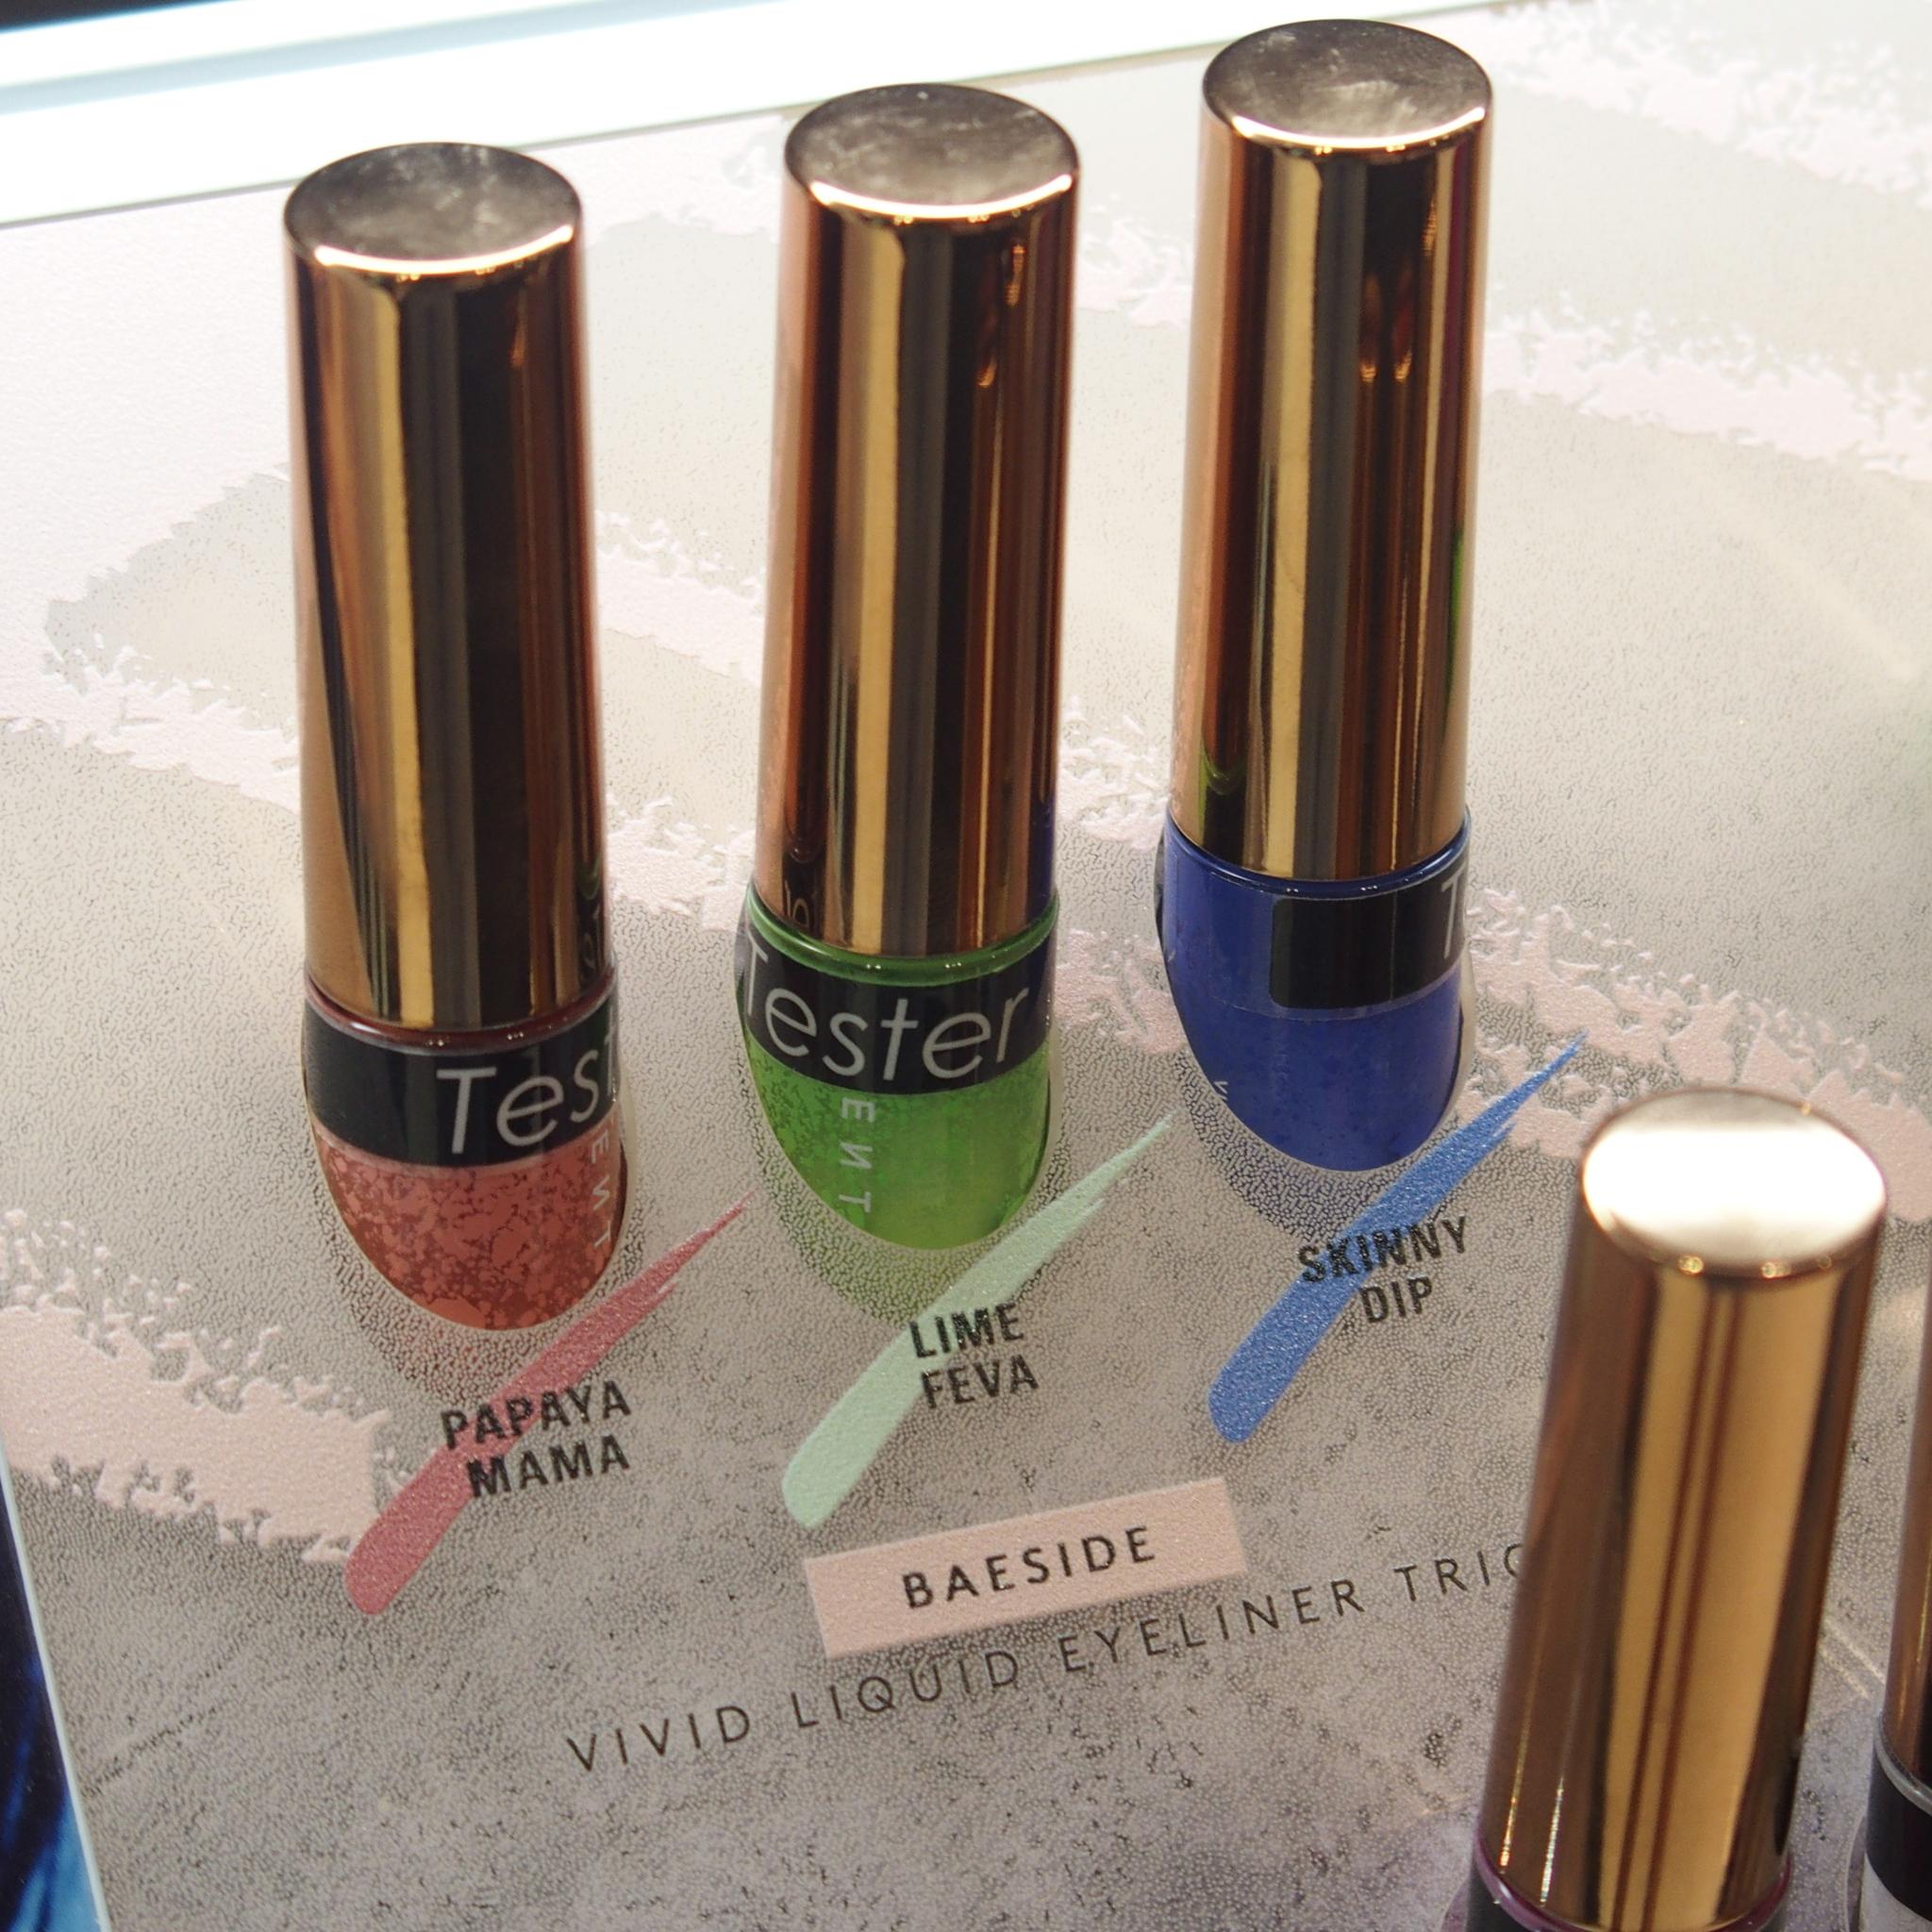 Fenty Beauty Vivid Liquid Eyeliner Trio - Baeside: Papaya Mama, Lime Feva, SKinny Dip